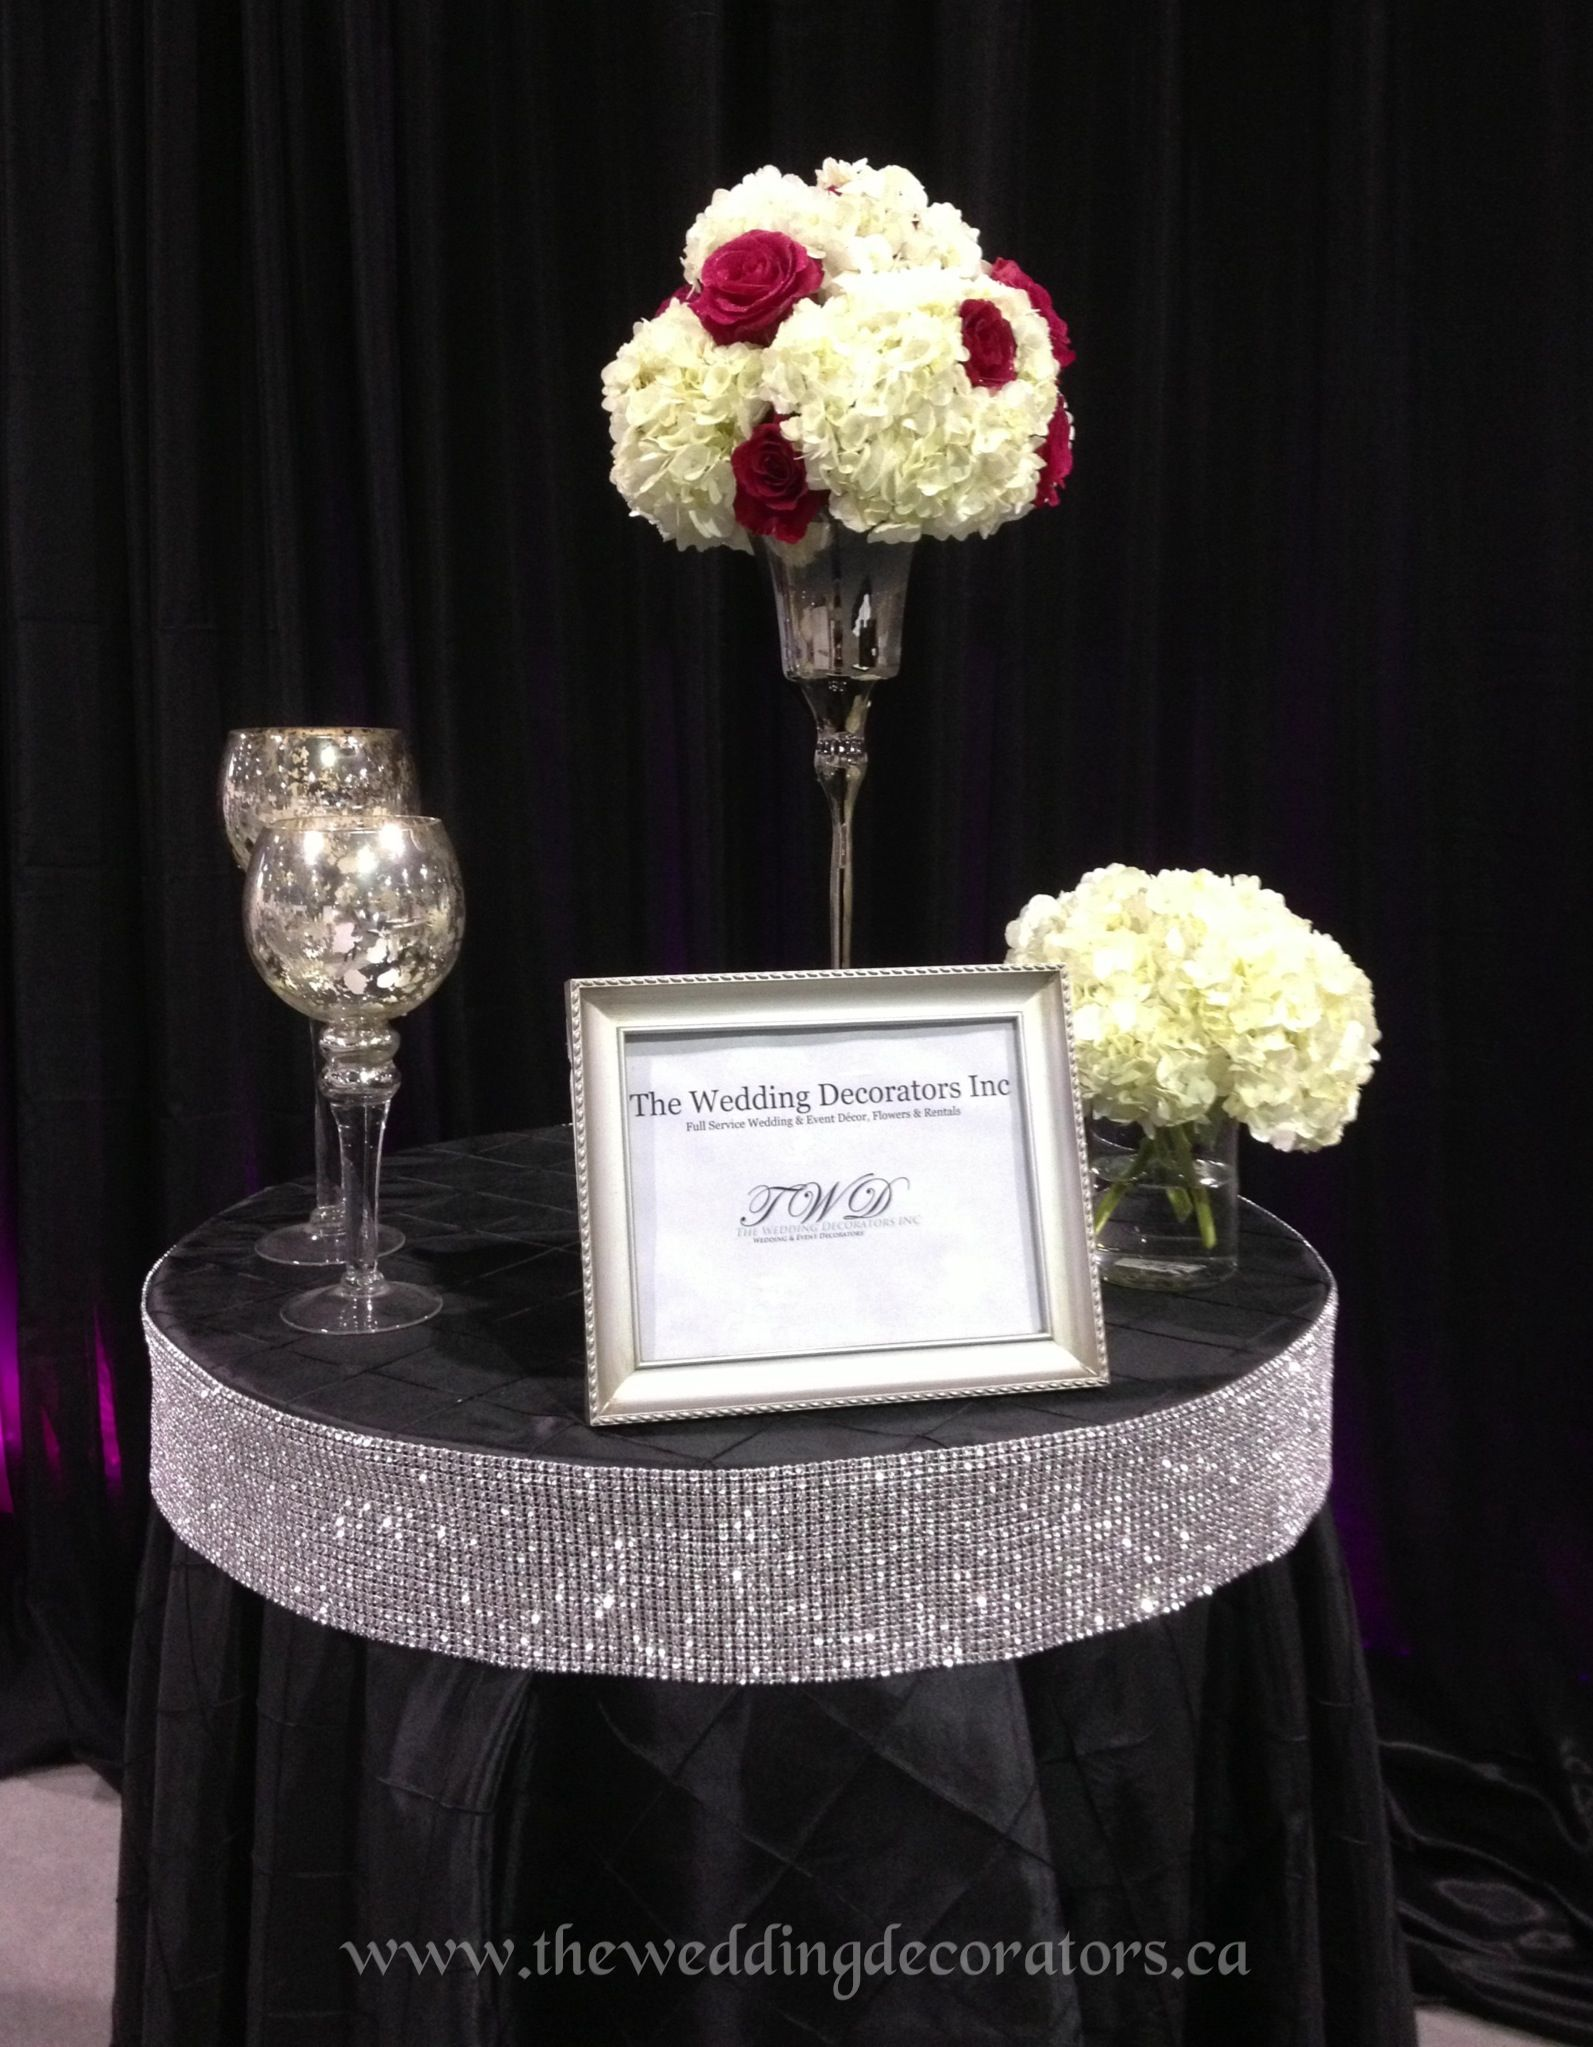 Black, Silver & Hot Pink Wedding Decor Bridal Show Booth